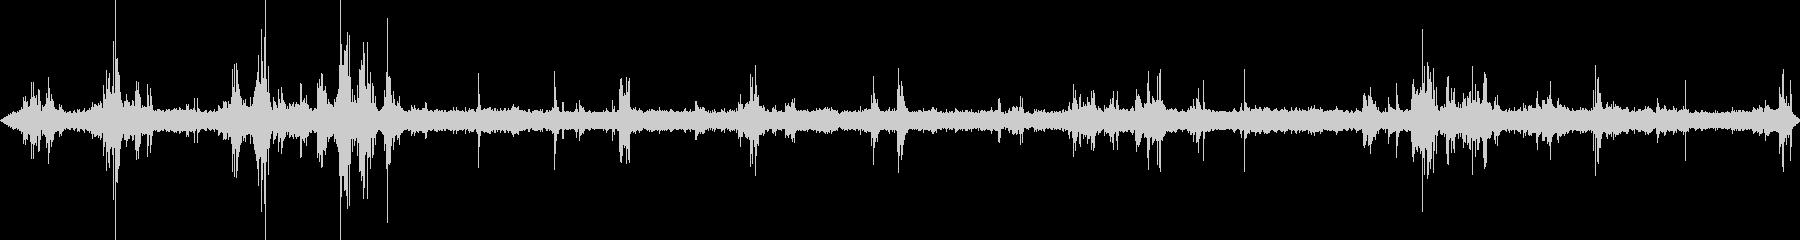 [ASMR] 風鈴とカエル_02の未再生の波形